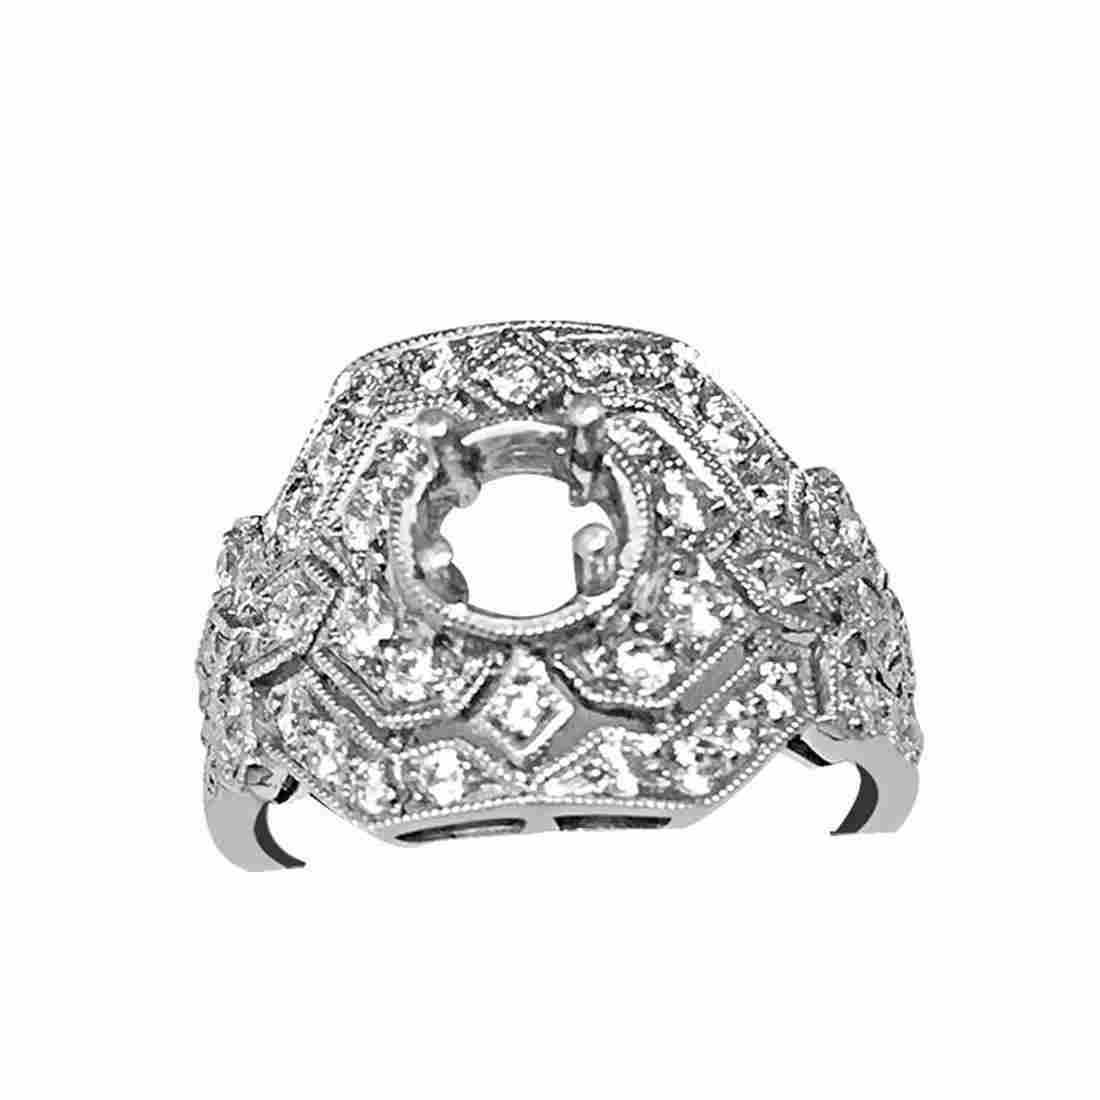 .91 CTW DIAMOND SEMI MOUNT RING IN 14K WHITE GOLD G-H/S